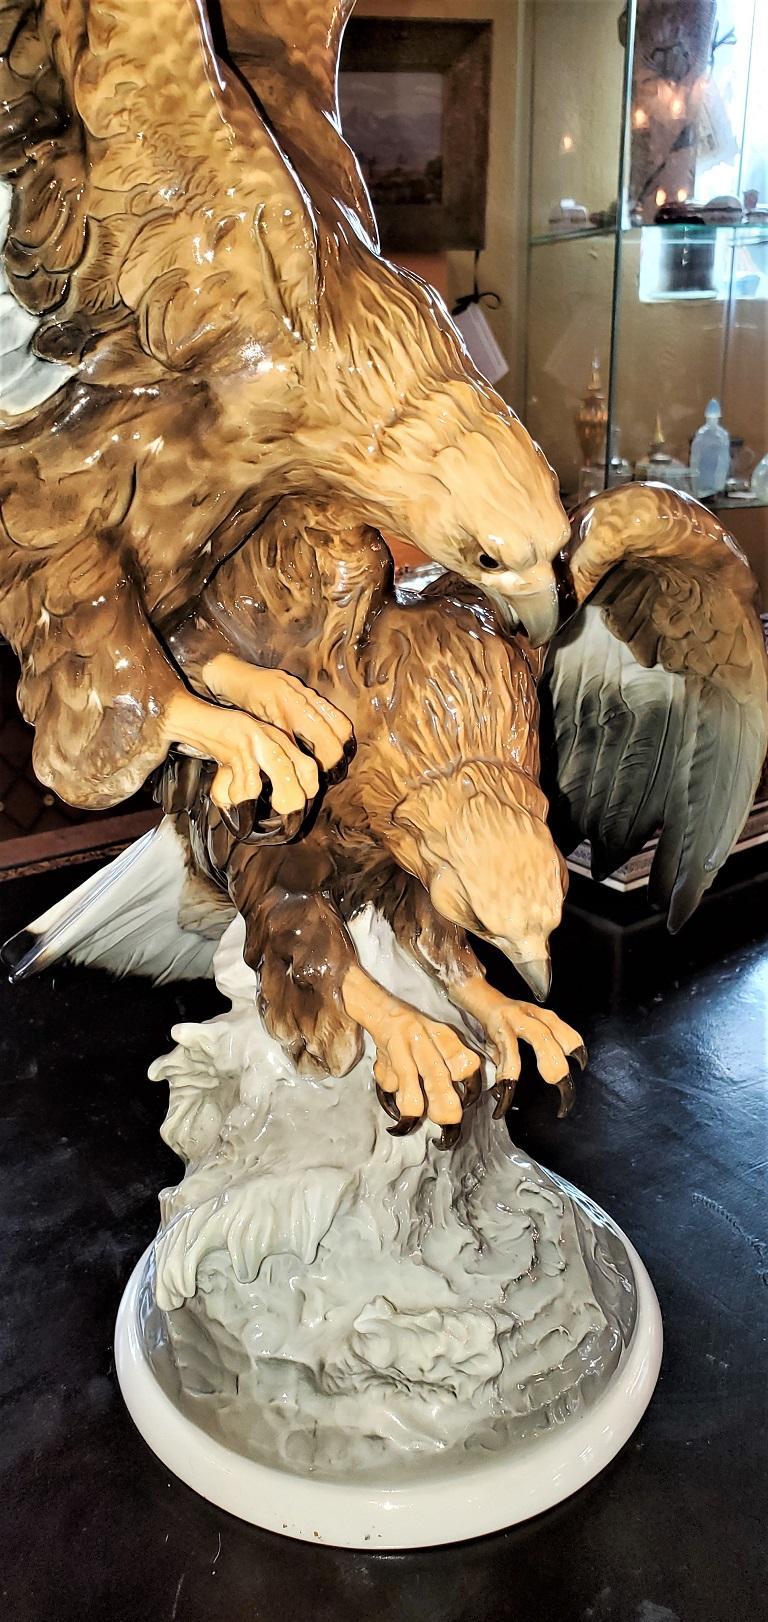 20C Selb German Porcelain Pair of Golden Eagles Sculpture For Sale 3